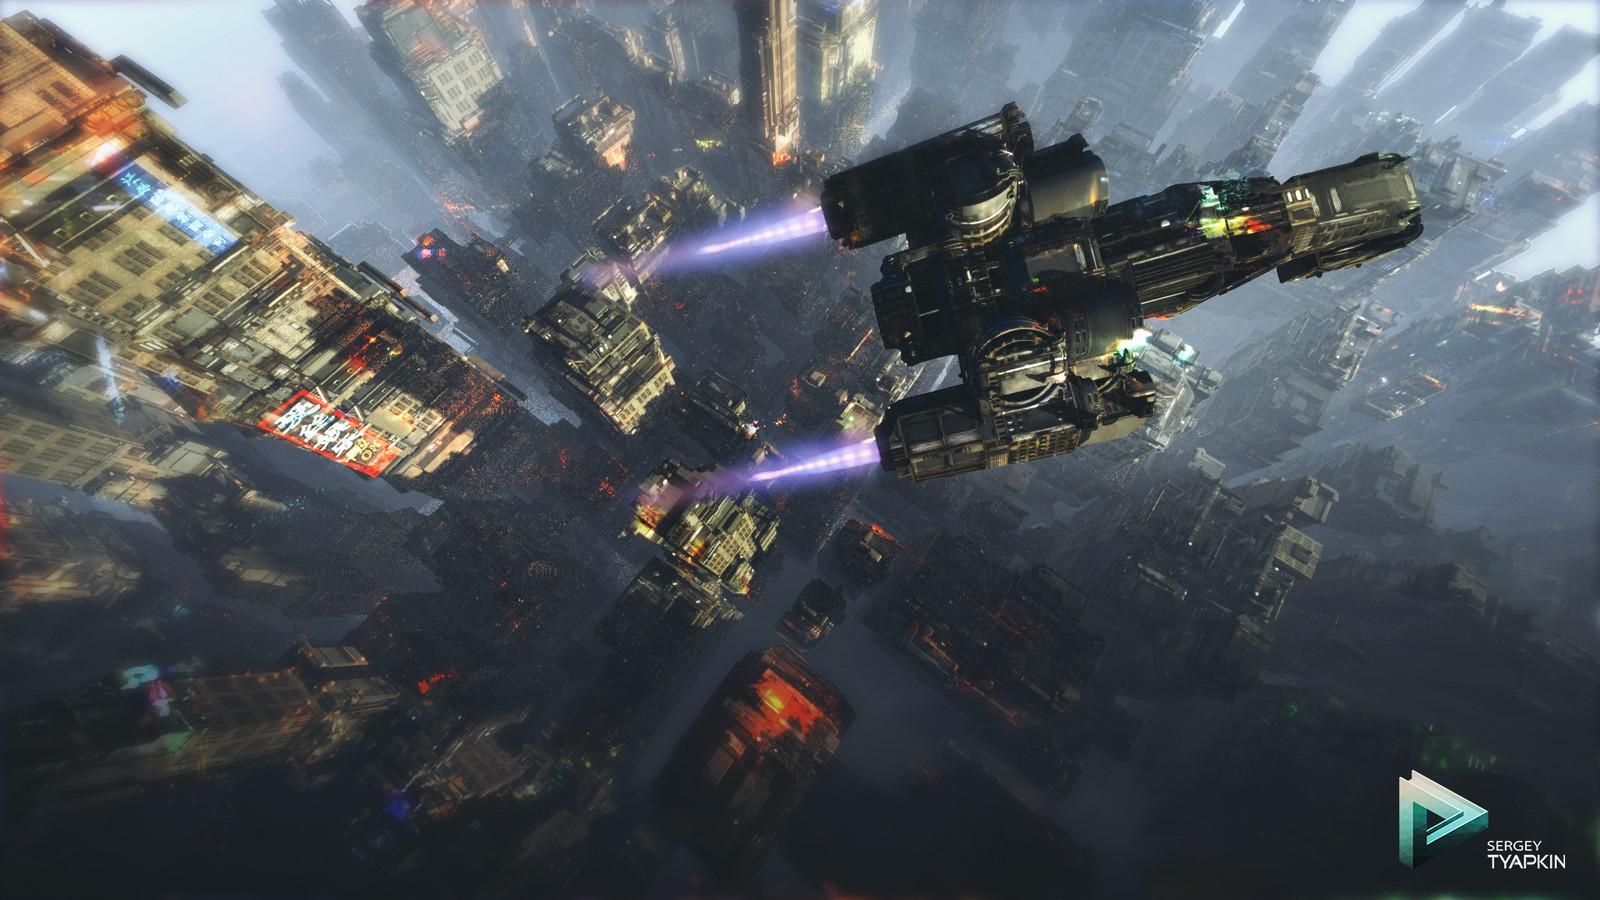 Sci Fi City Concept